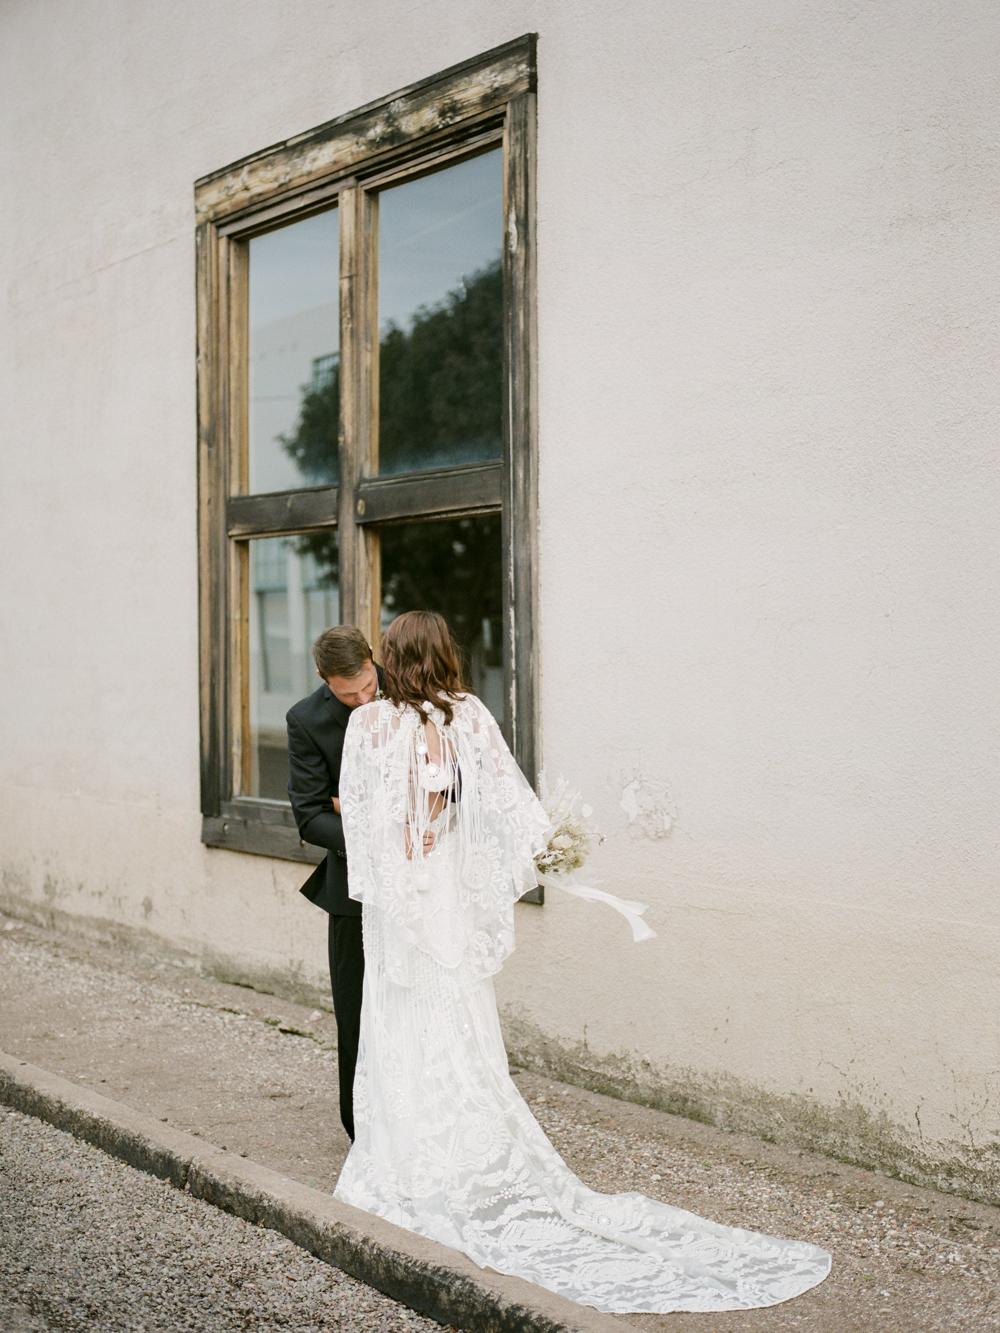 Marfa wedding photographer- destination wedding photographer-christine gosch - film photographer - elopement photographer-21.jpg